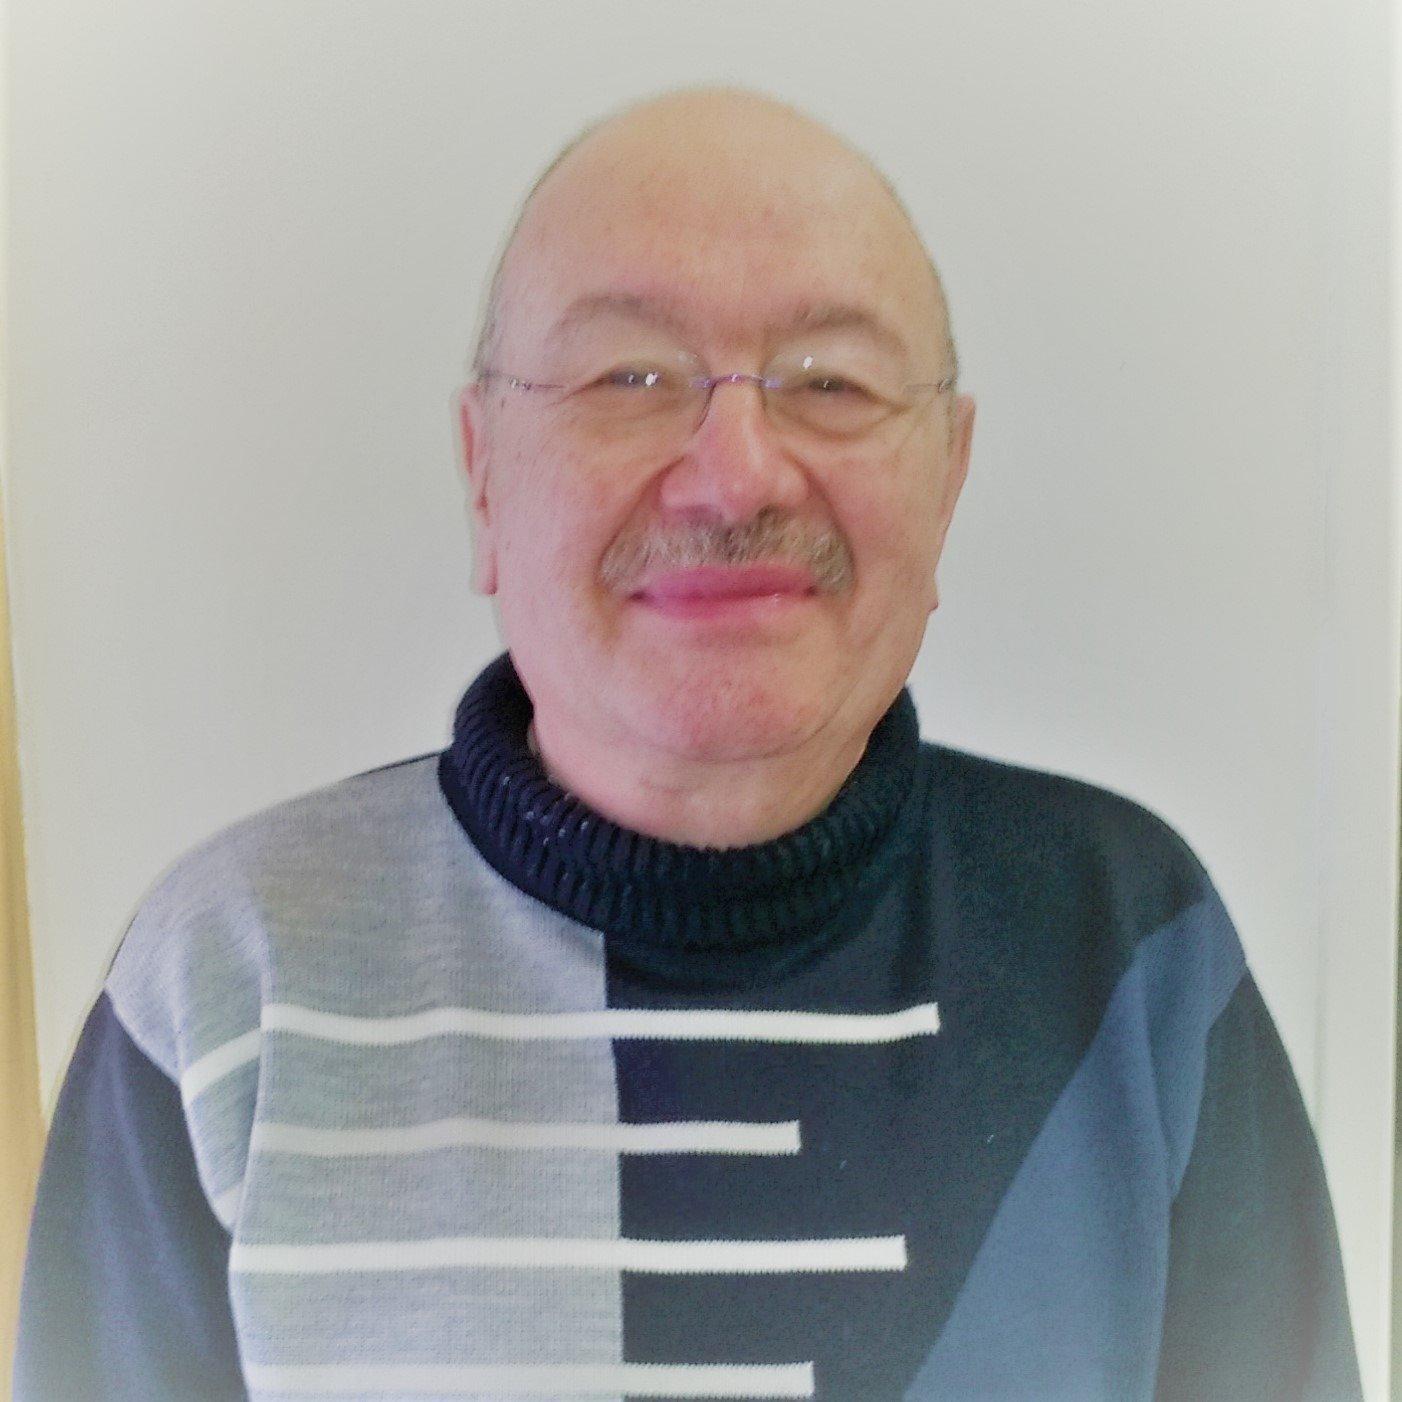 Daniel Delattre